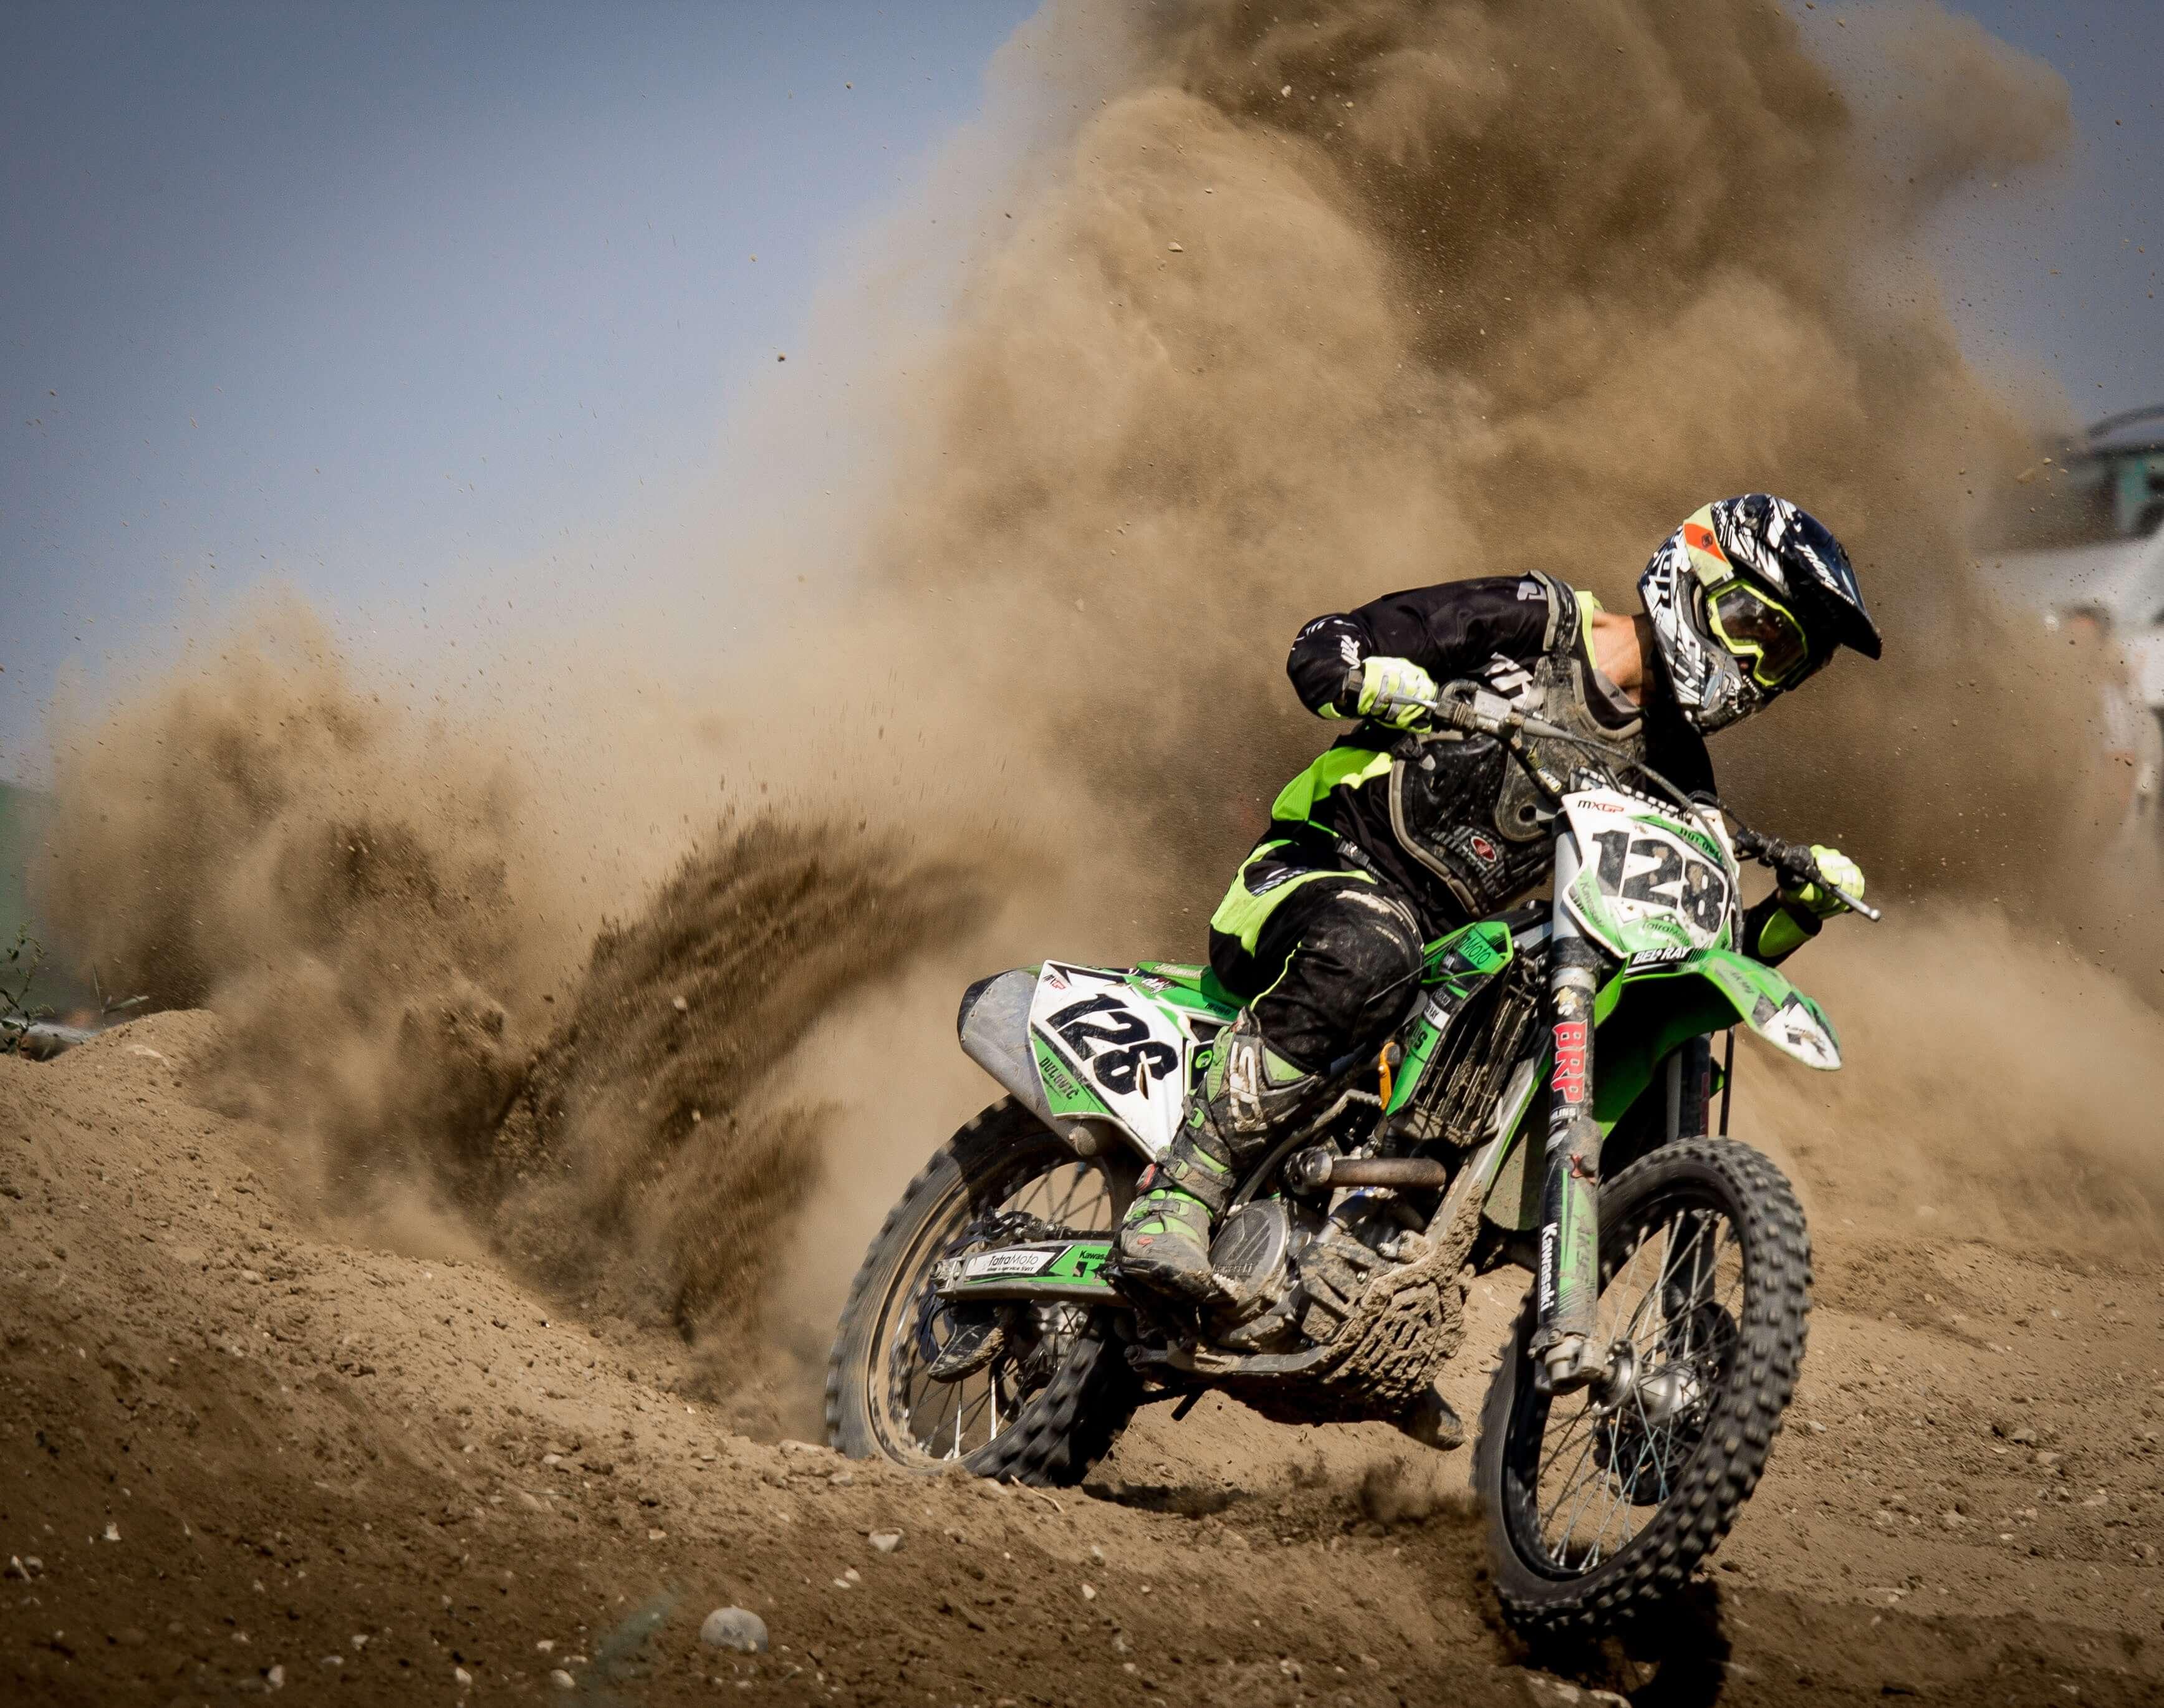 Dirt bike rider riding kicking up dirt